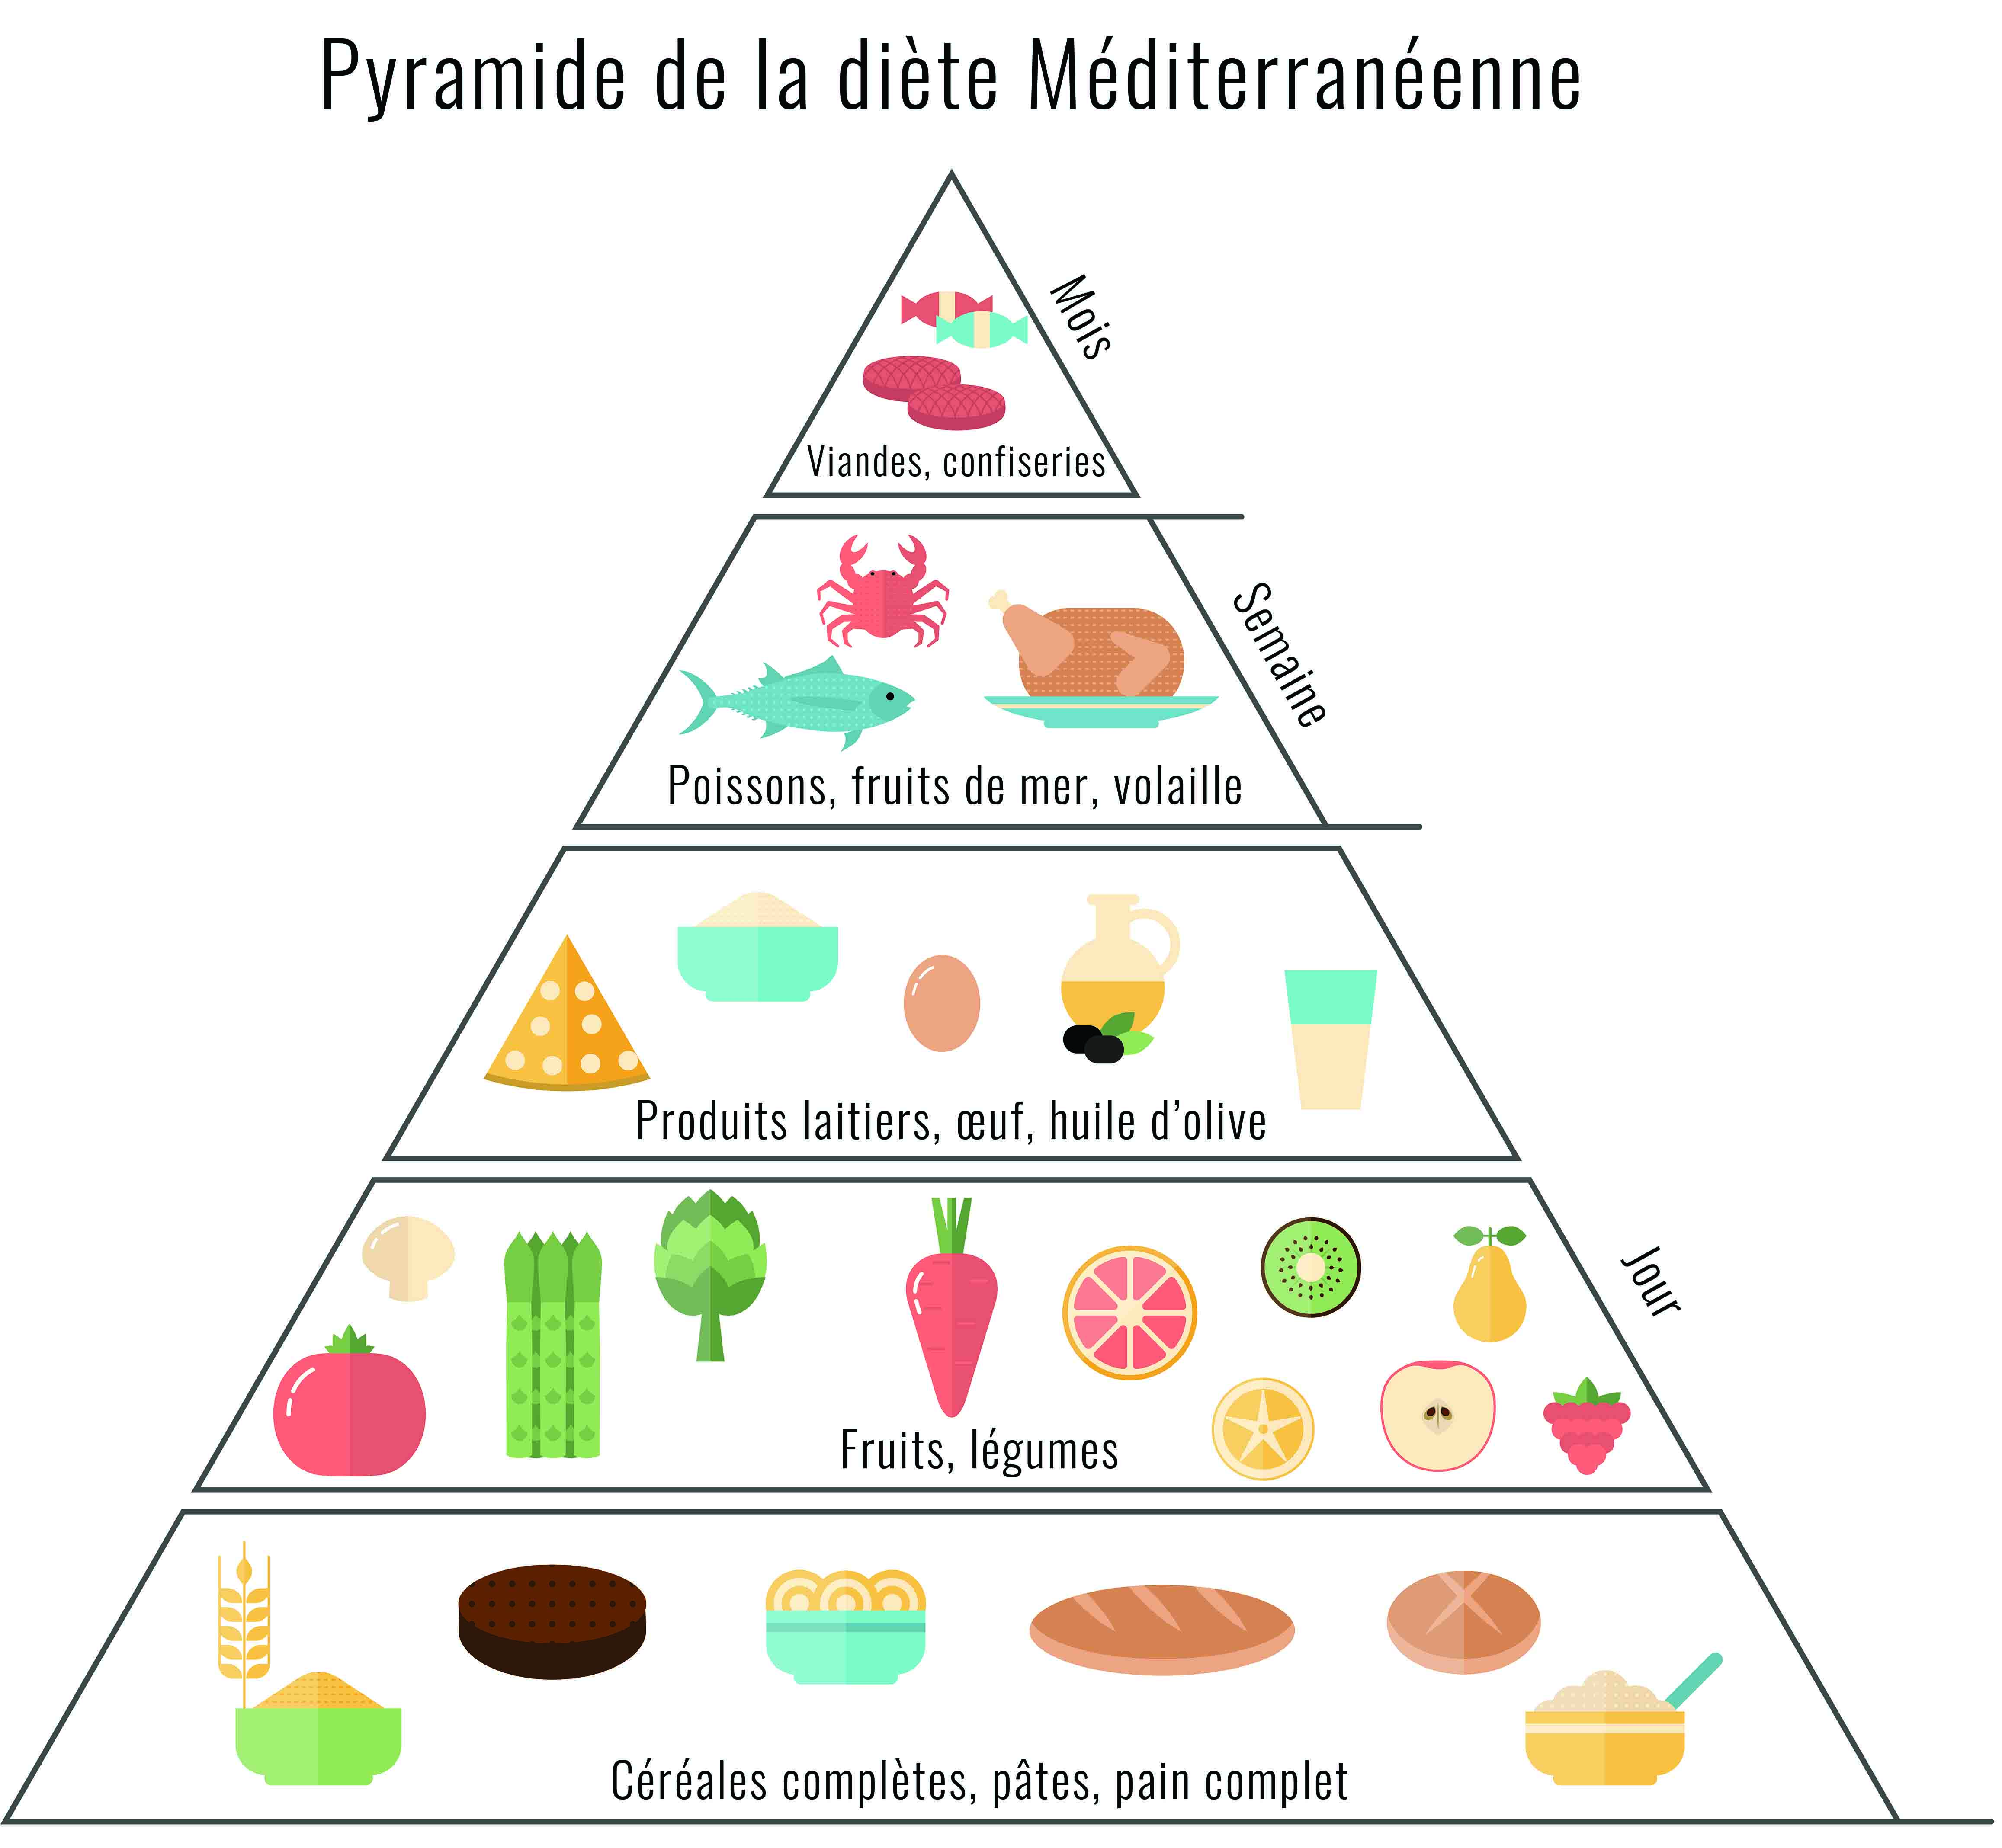 pyramide de la diete mediterranéenne